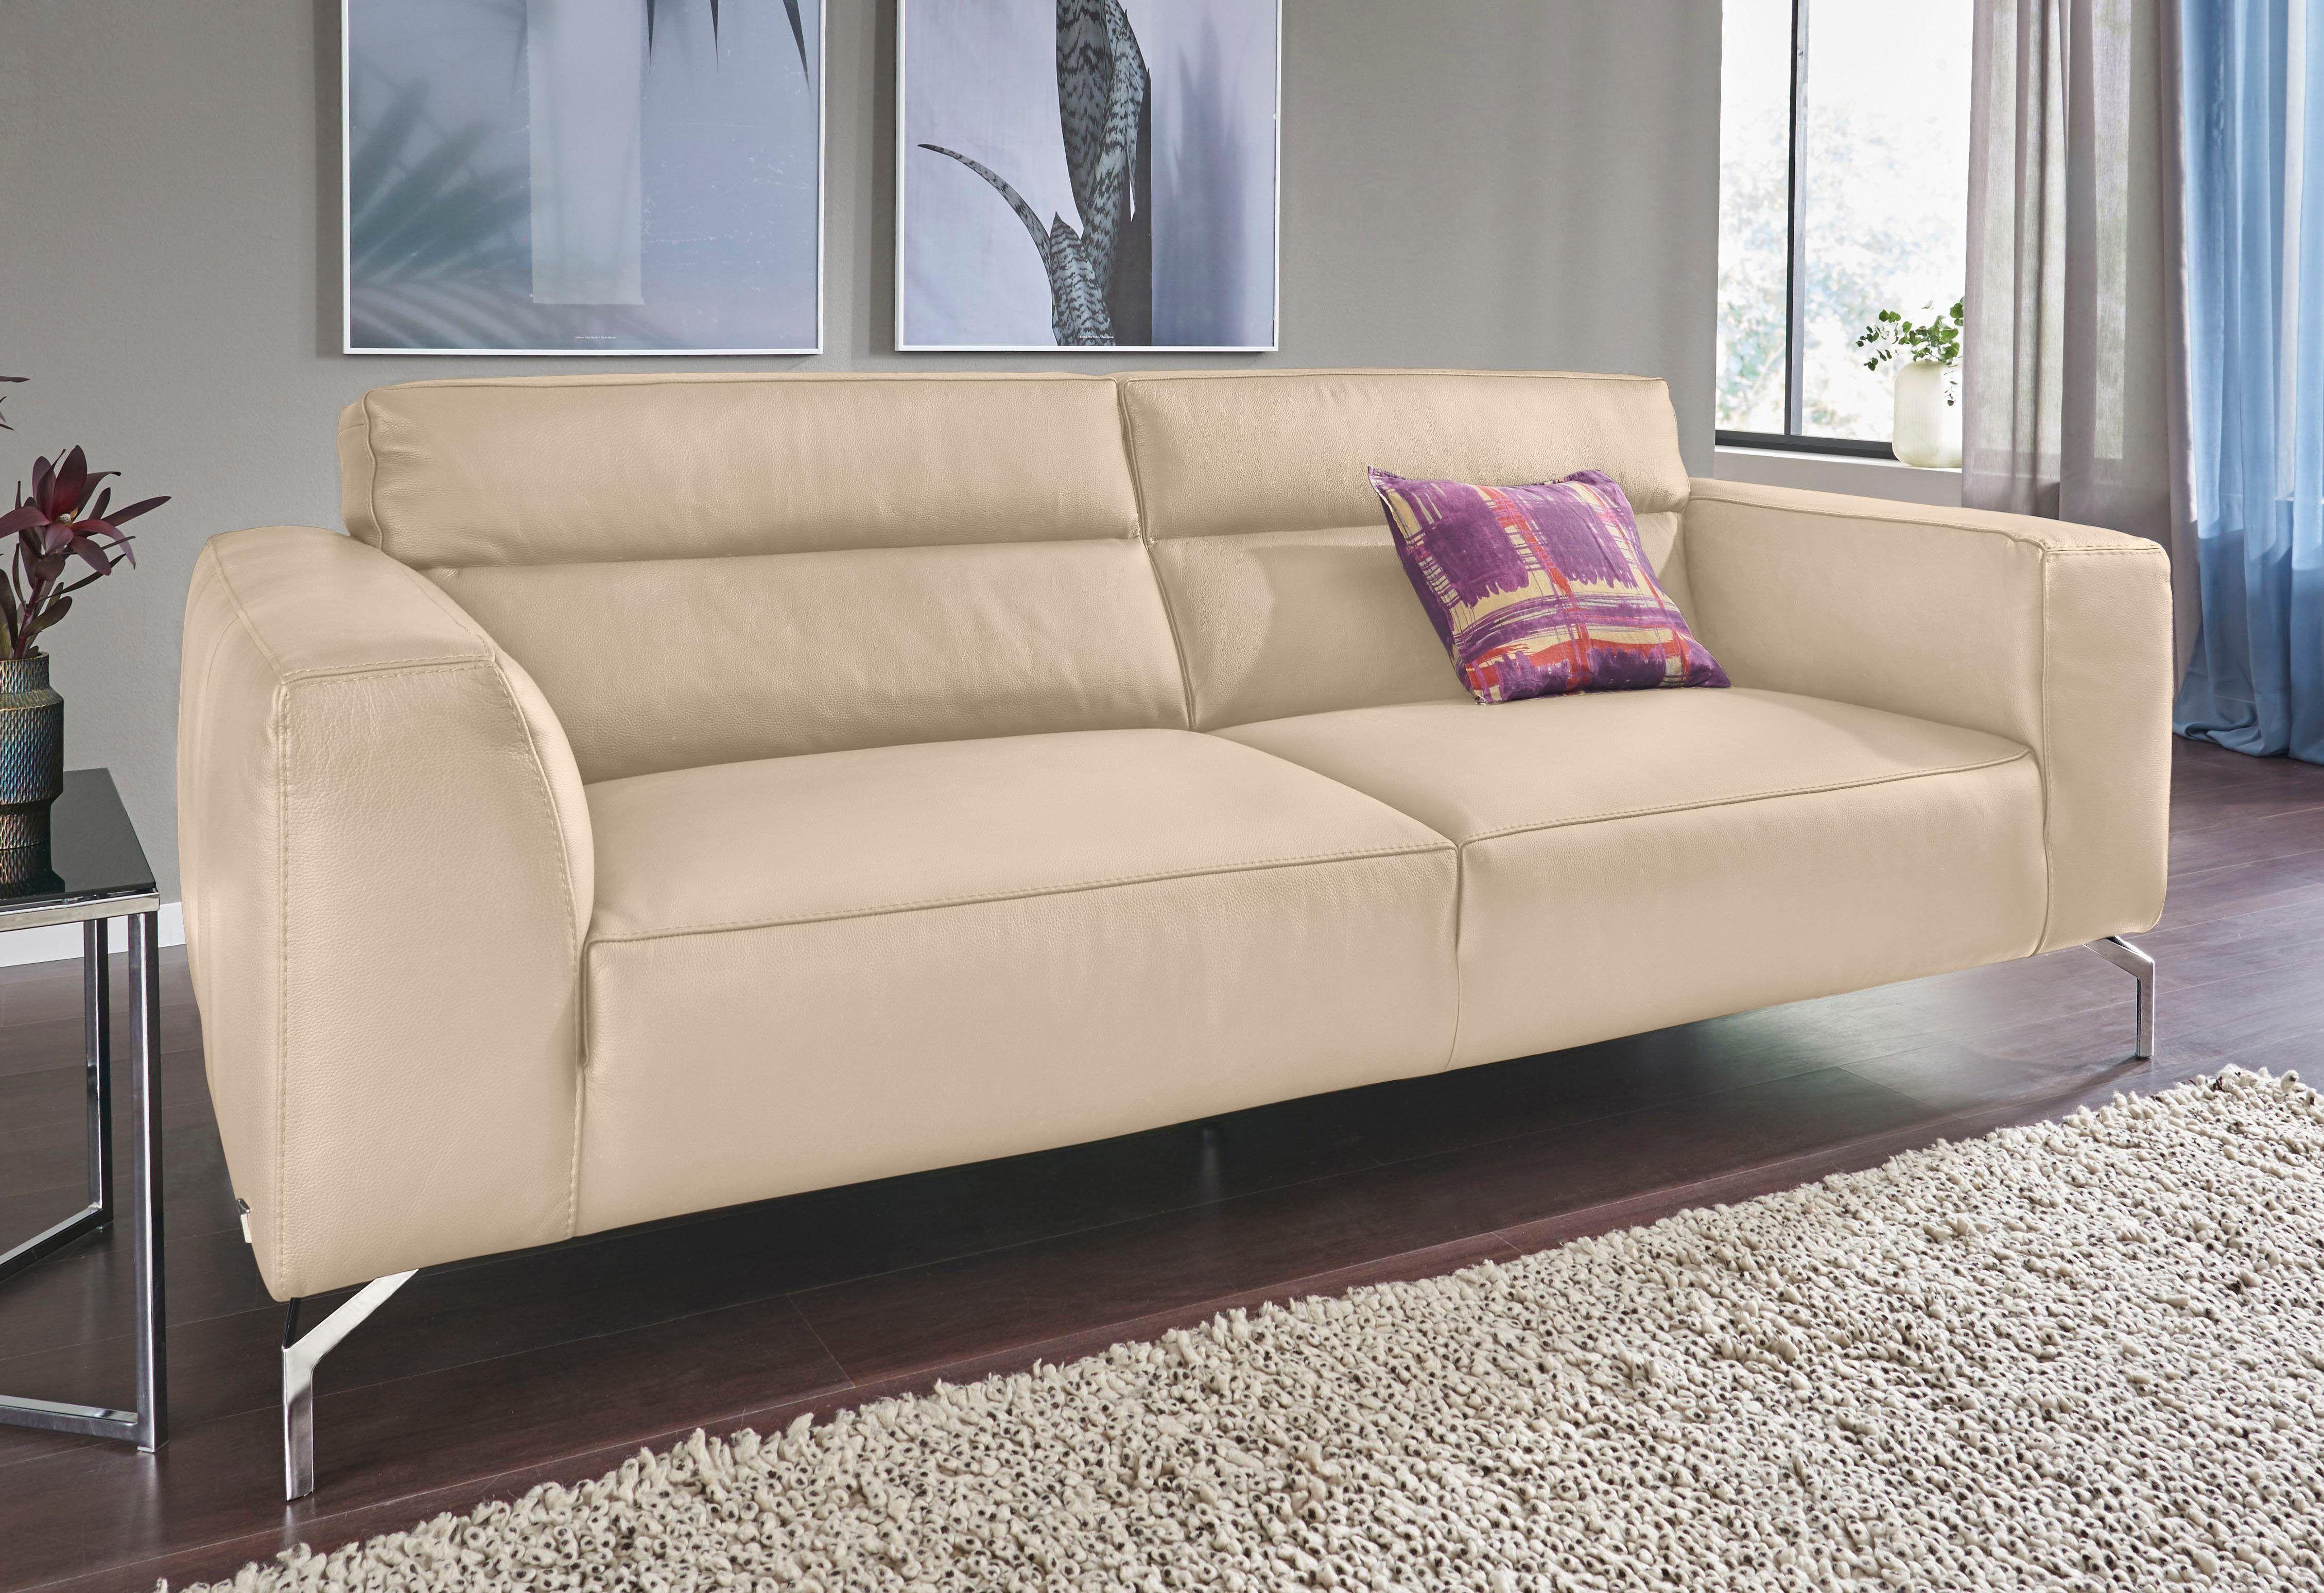 Calia Italia 3 Sitzer Soho Beige Fsc Zertifiziert Jetzt Bestellen Unter Https Moebel Ladendirekt De Wohnzimmer Sofa Mit Bildern 3 Sitzer Sofa Sofas Sofa Leder Braun